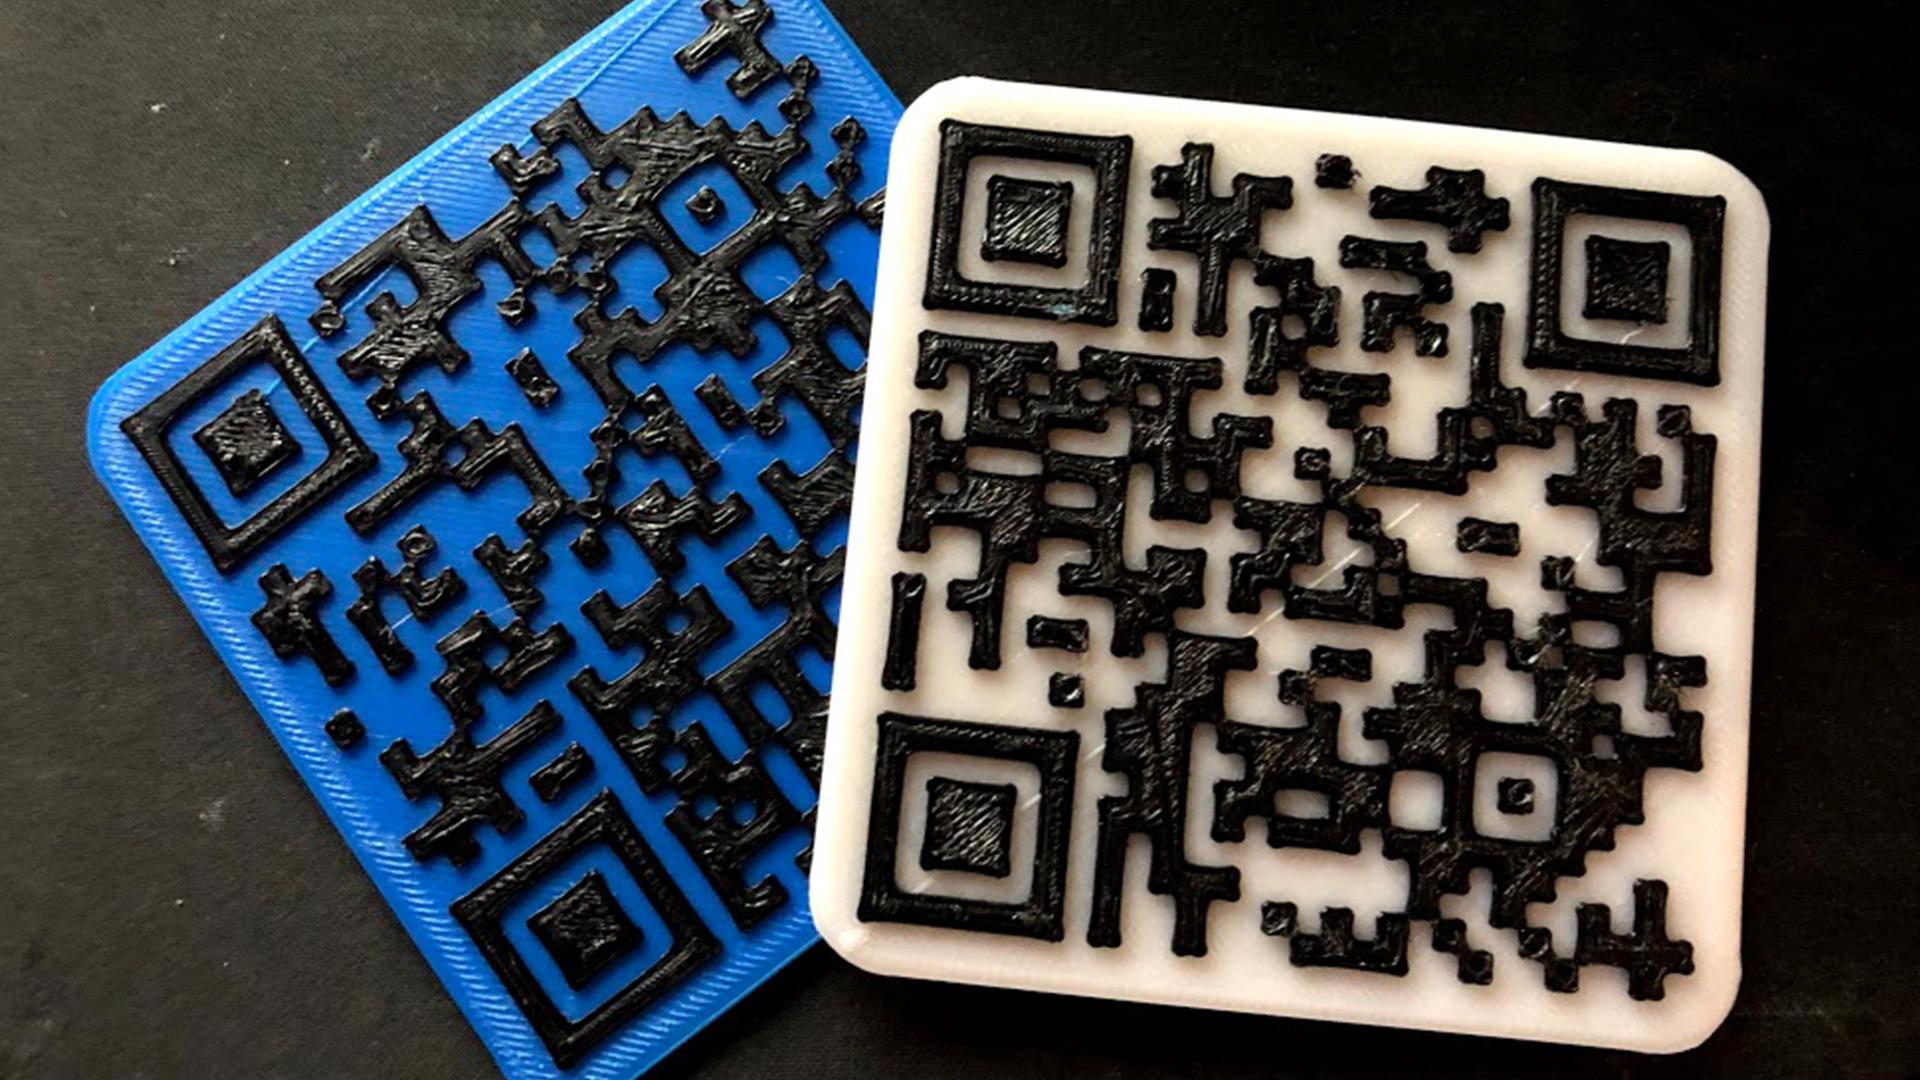 3D Printed QR WiFi Puck